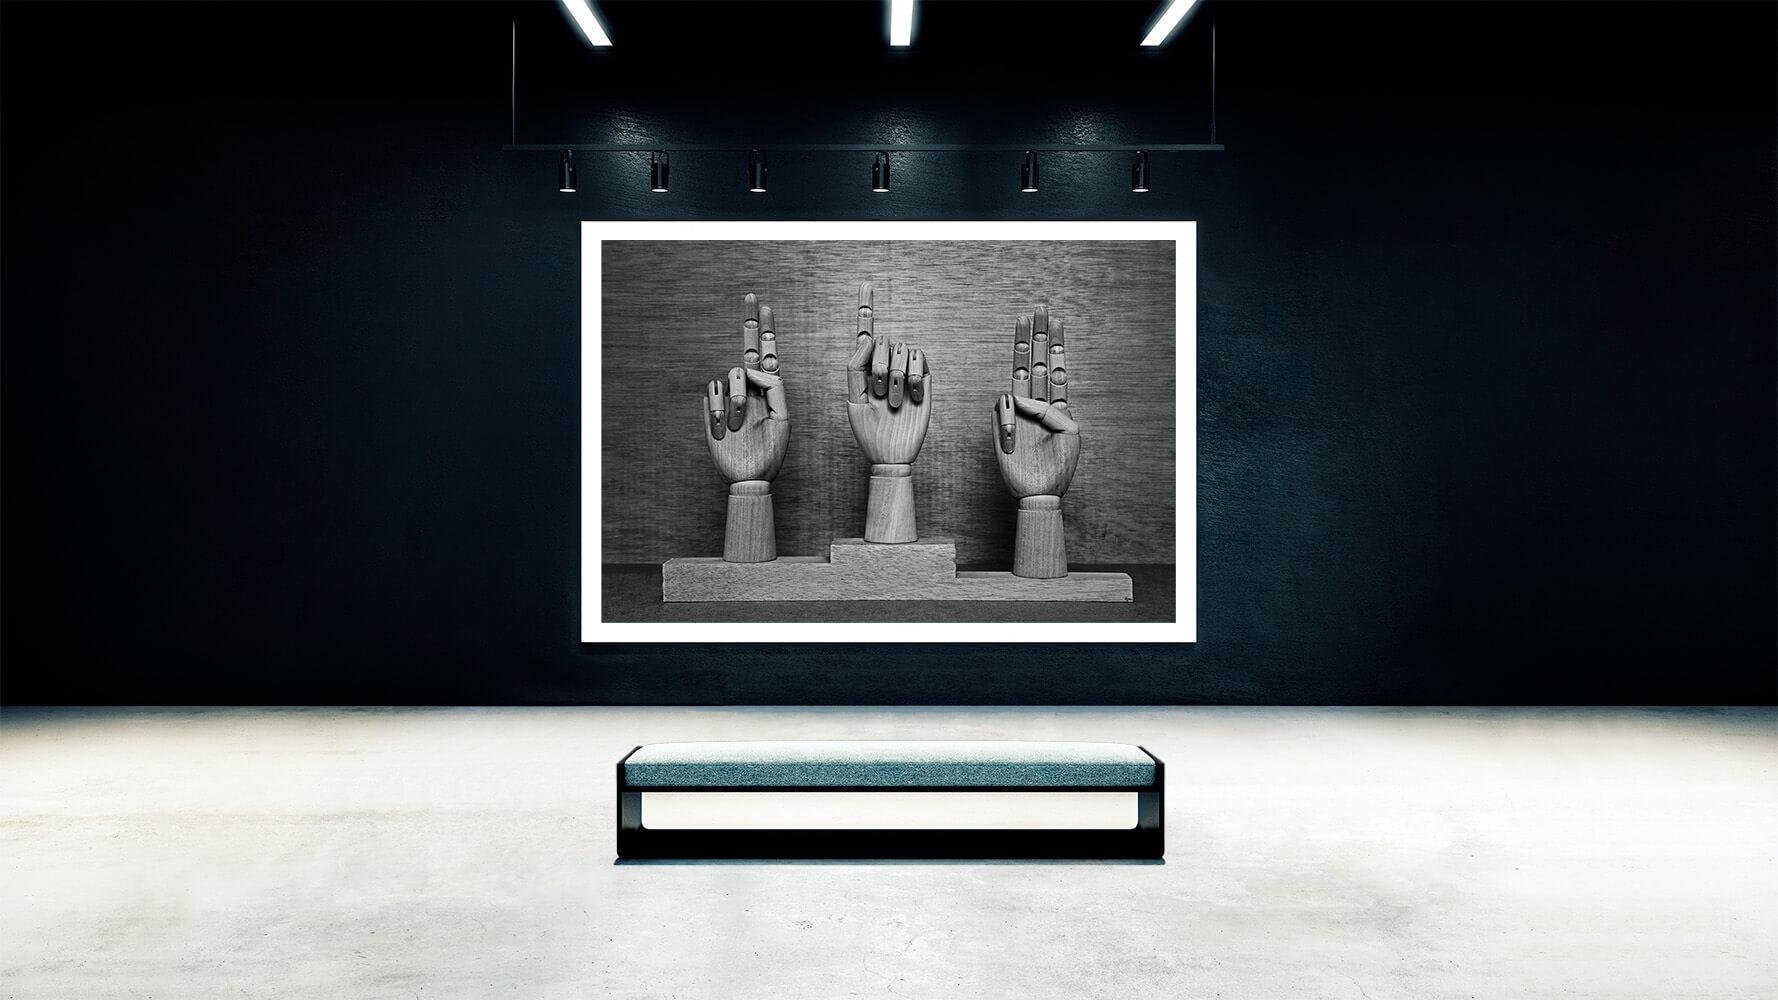 Viktor-van-der-lak-podium-exposicion-talk-to-me-Horno-Virtual-Gallery-galeria-arte-fotografia-artistica-edicion-limitada-decoracio